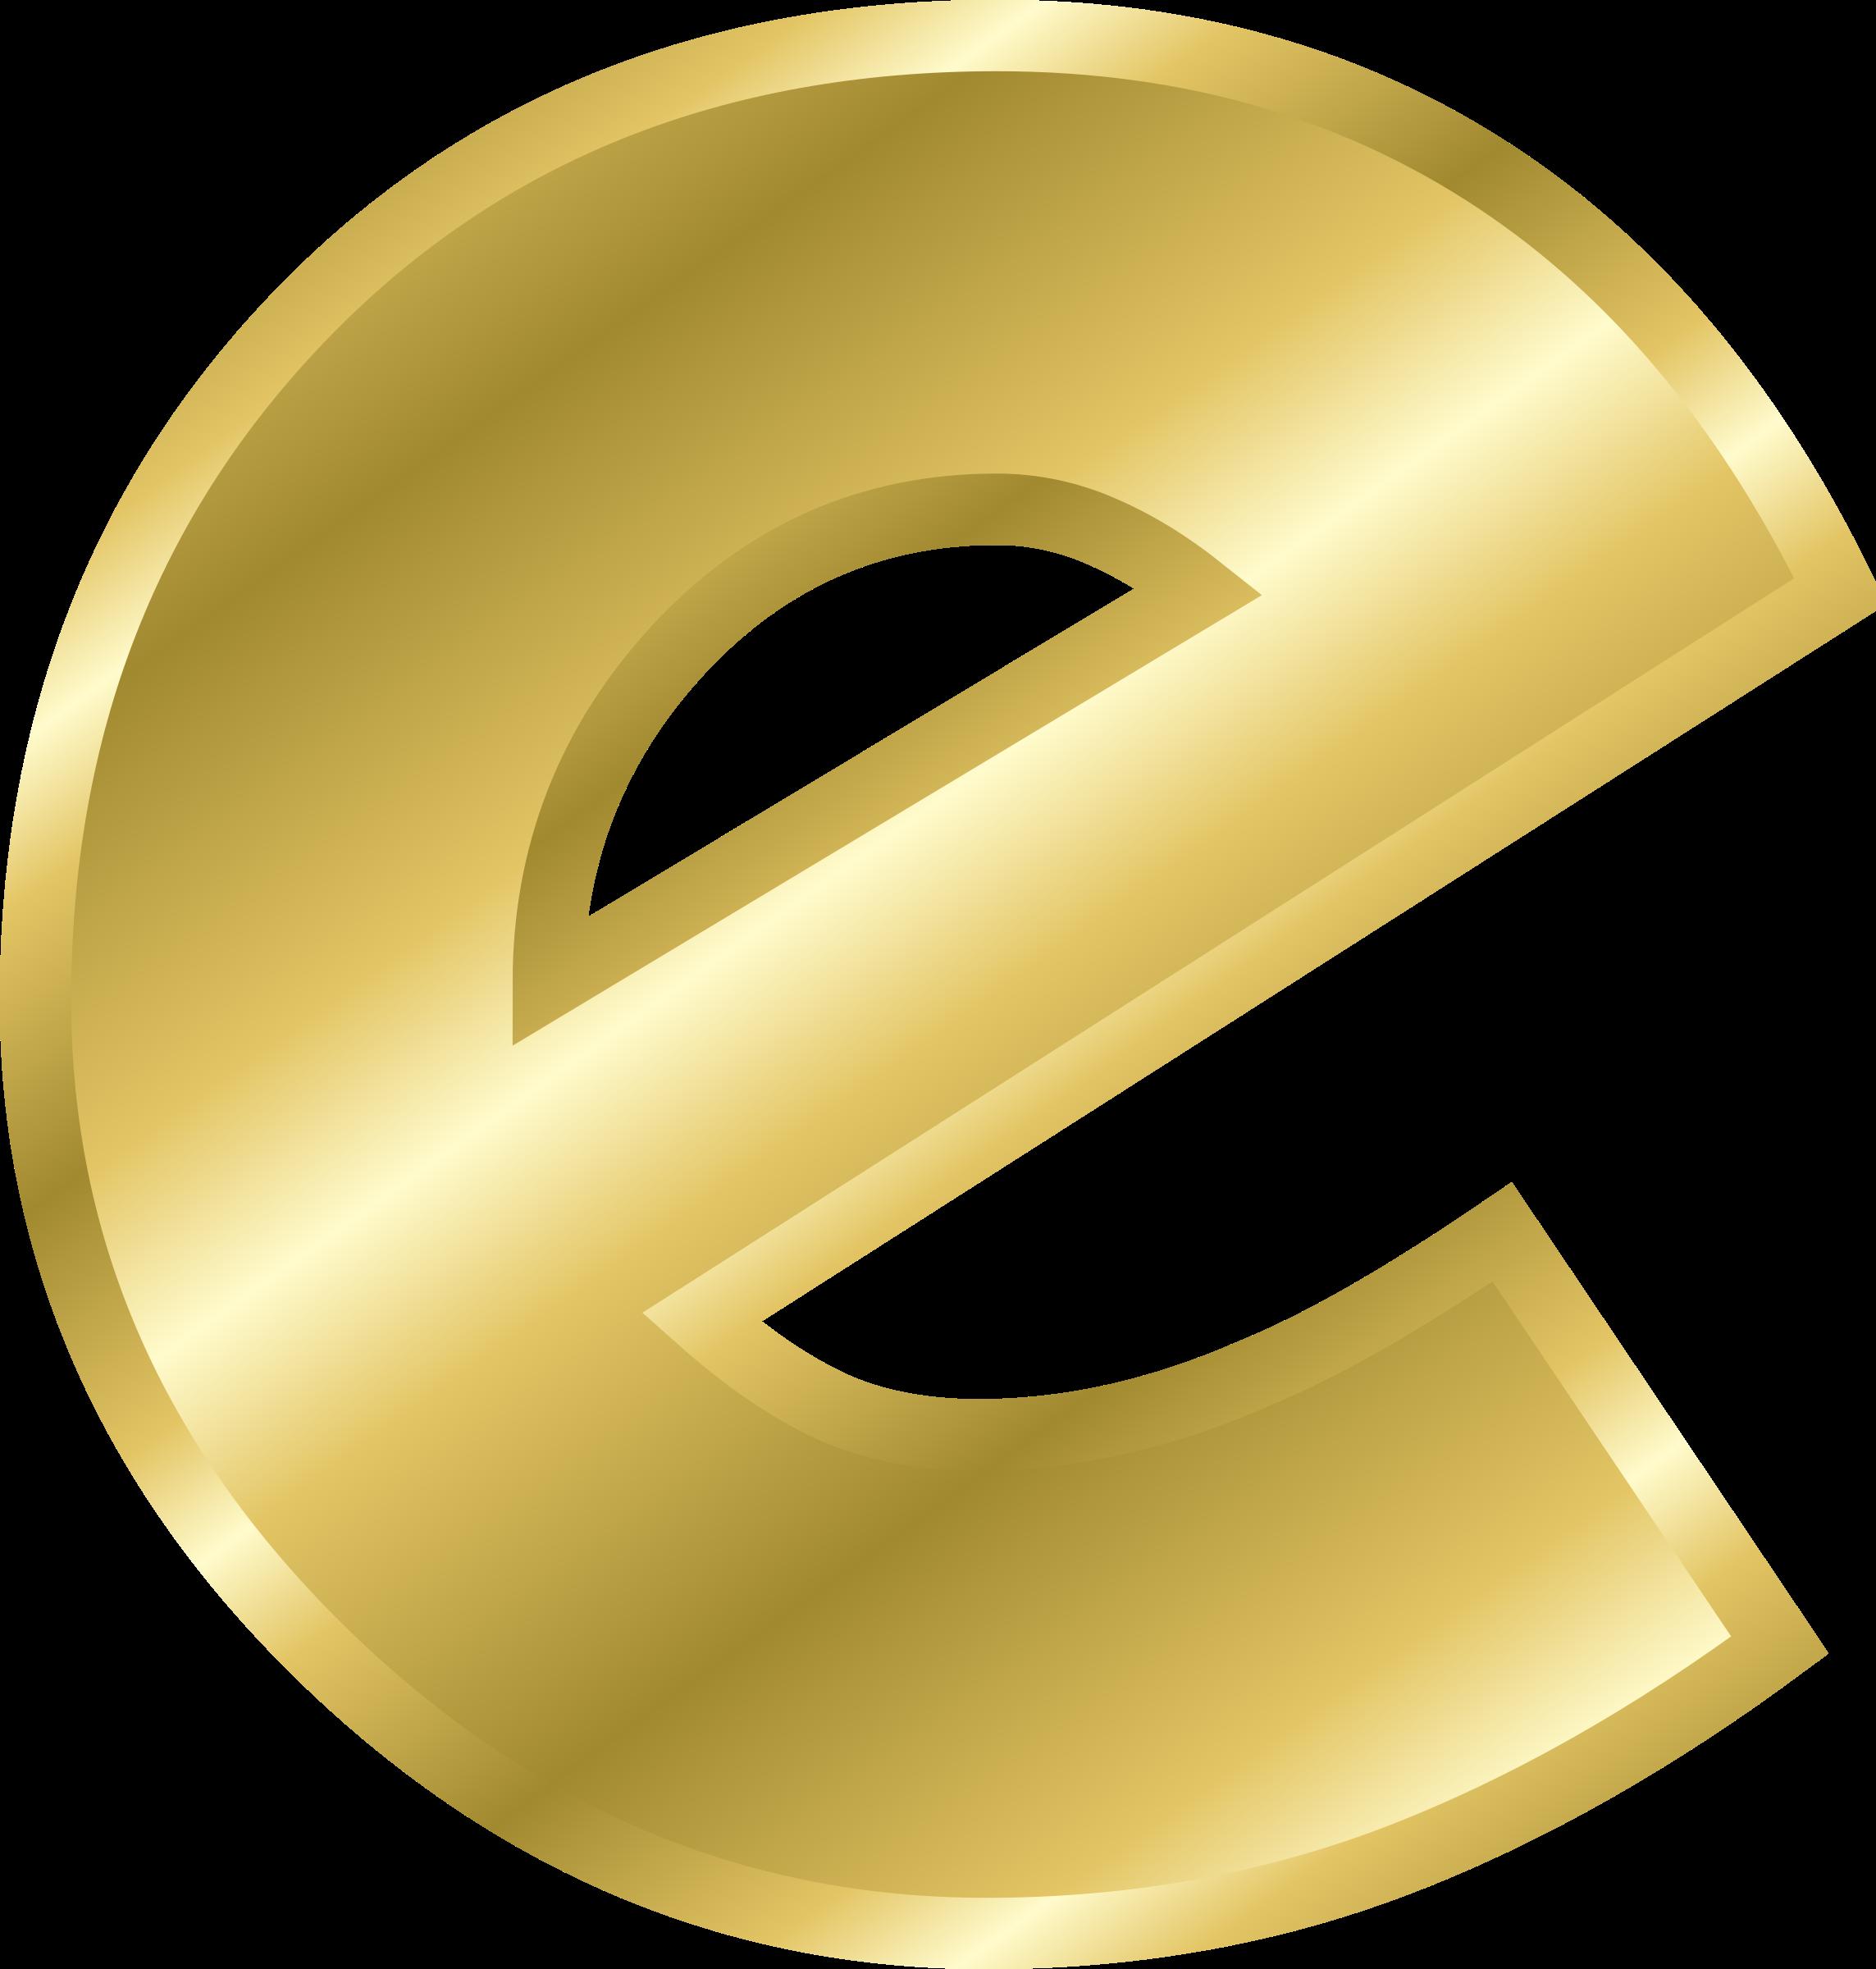 E clipart yellow letter. Effect letters alphabet gold